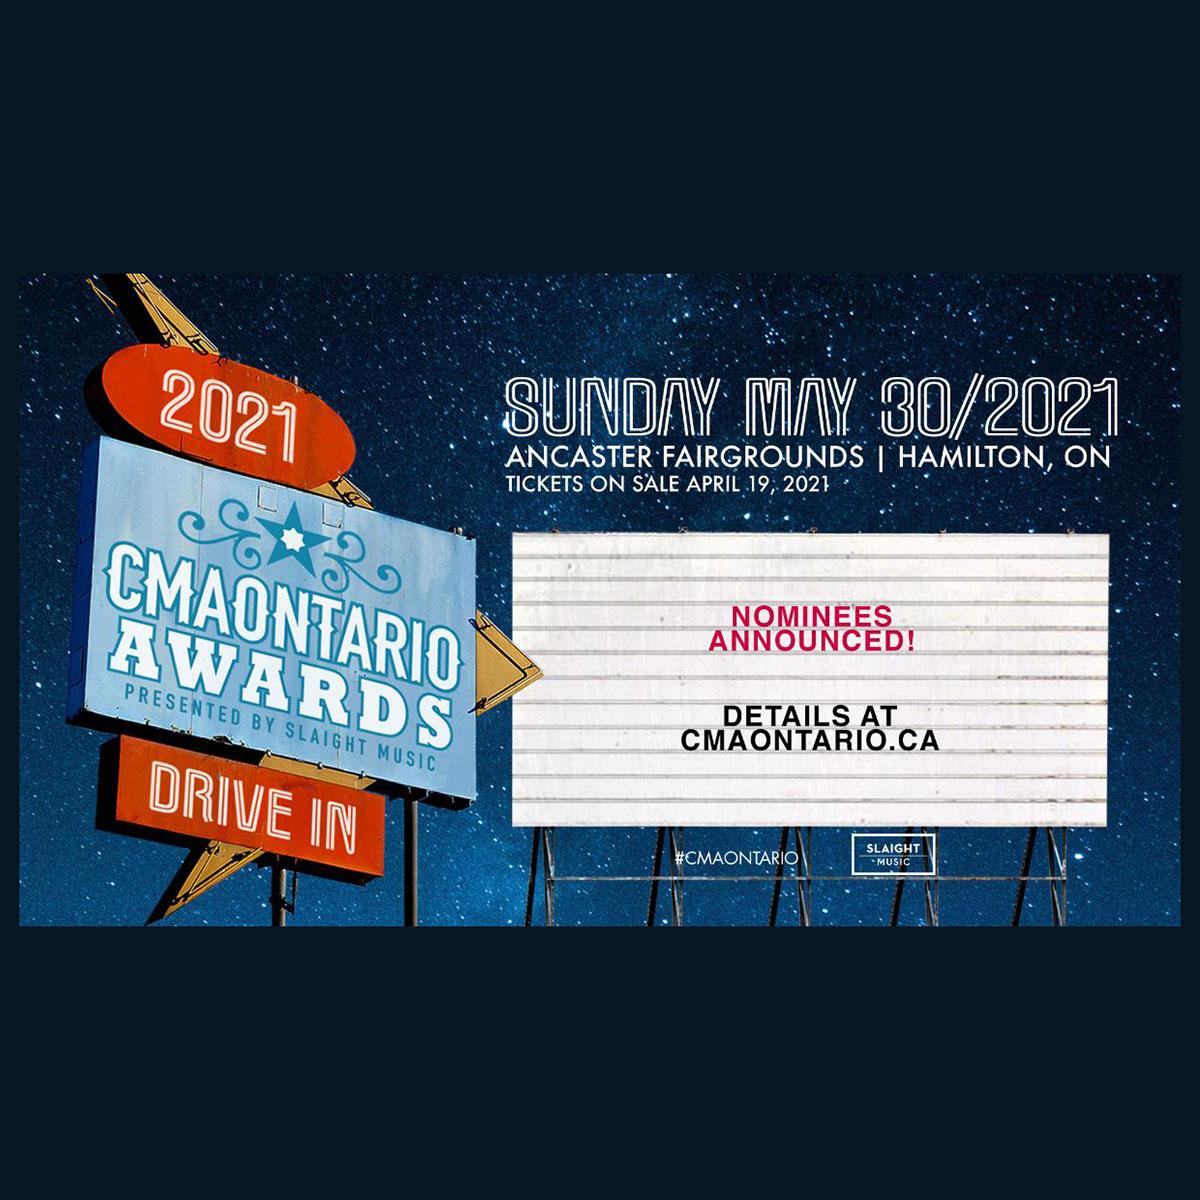 2021 CMAOntario Award Nominees Announced